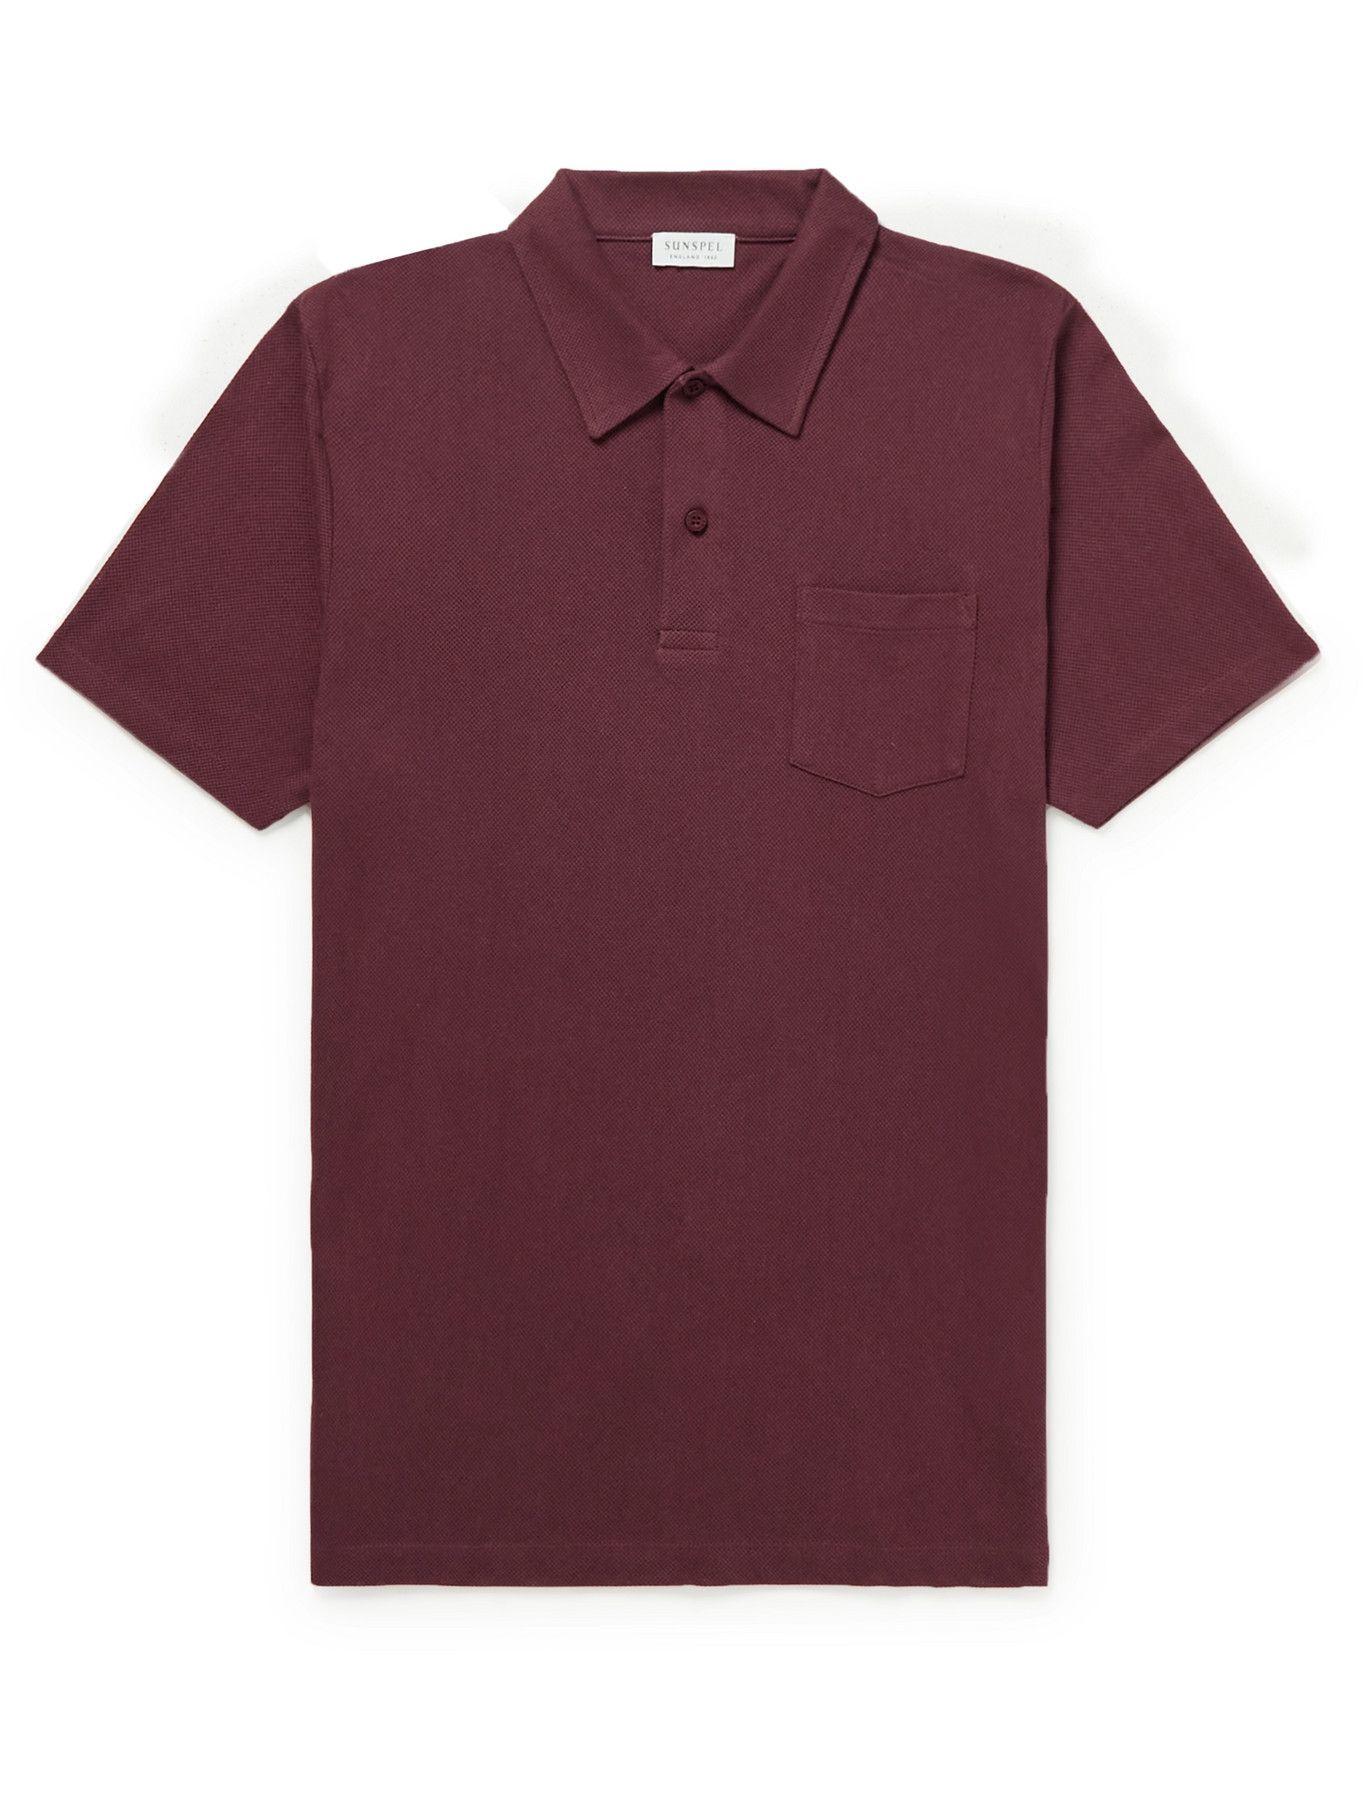 SUNSPEL - Riviera Slim-Fit Cotton-Mesh Polo Shirt - Red